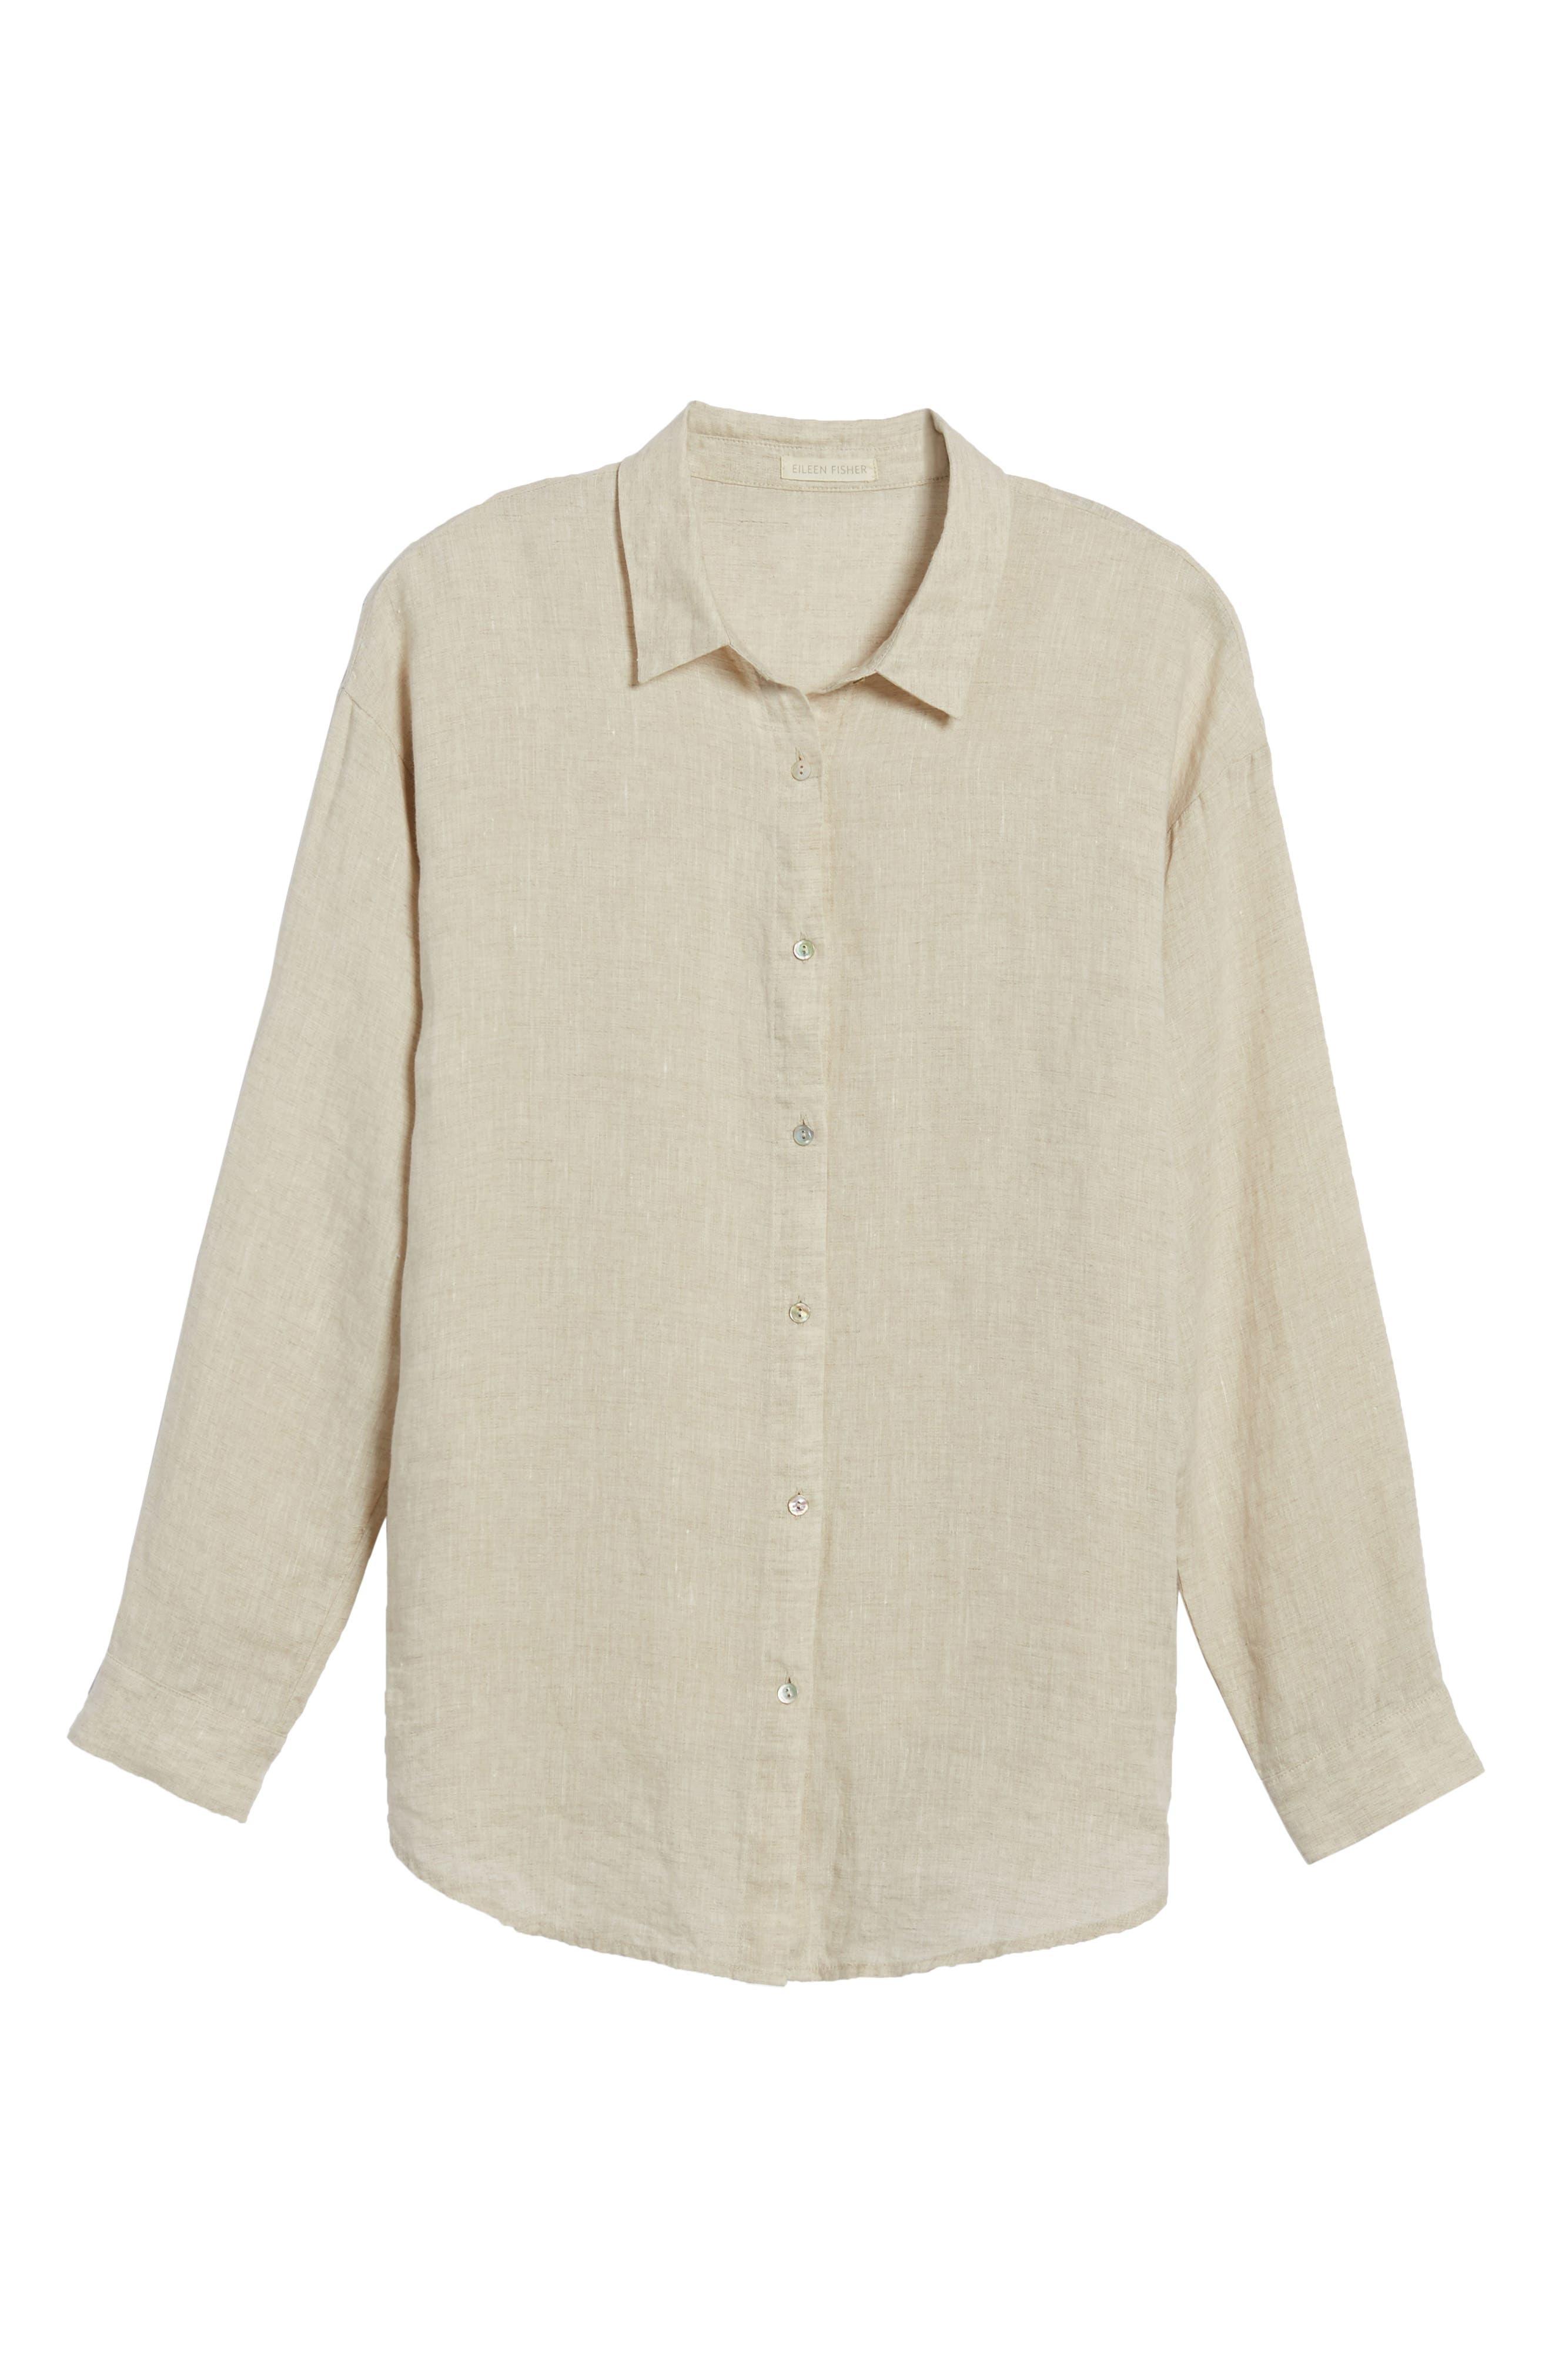 Organic Linen Shirt,                             Alternate thumbnail 7, color,                             Natural